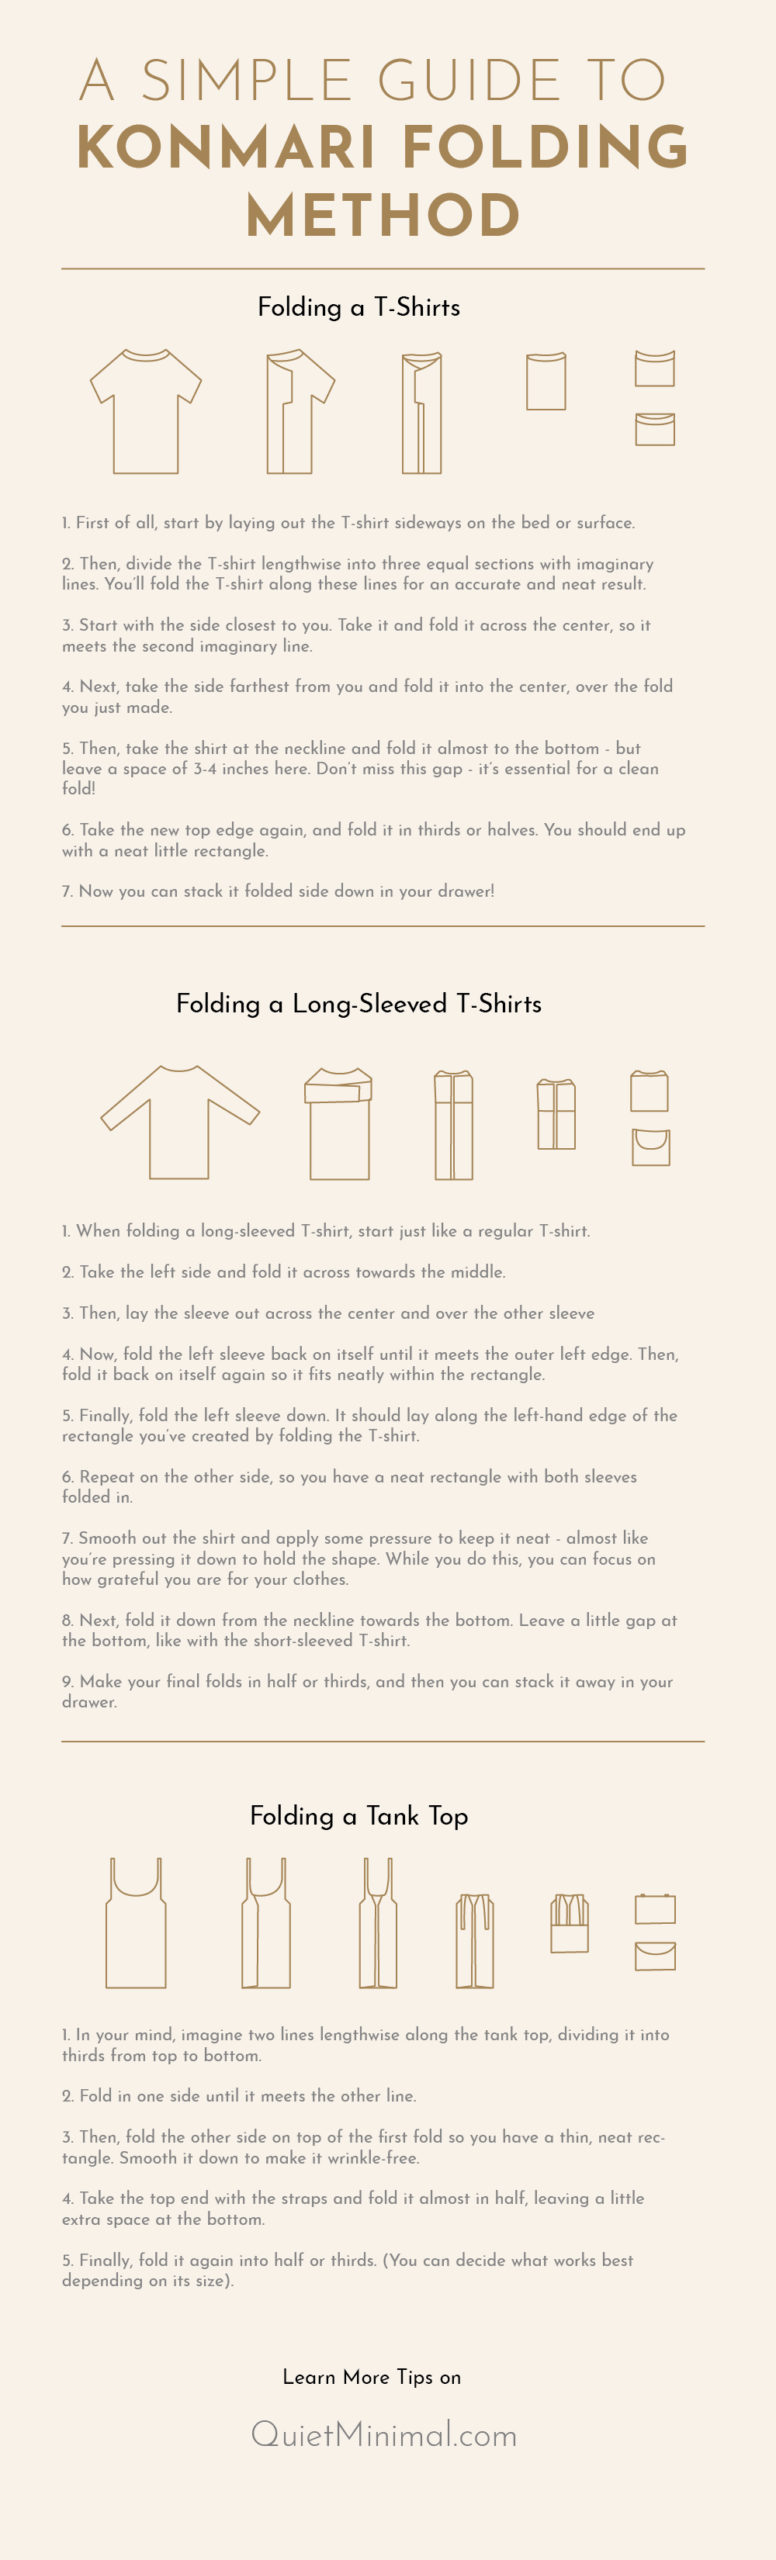 Konmari Folding Method